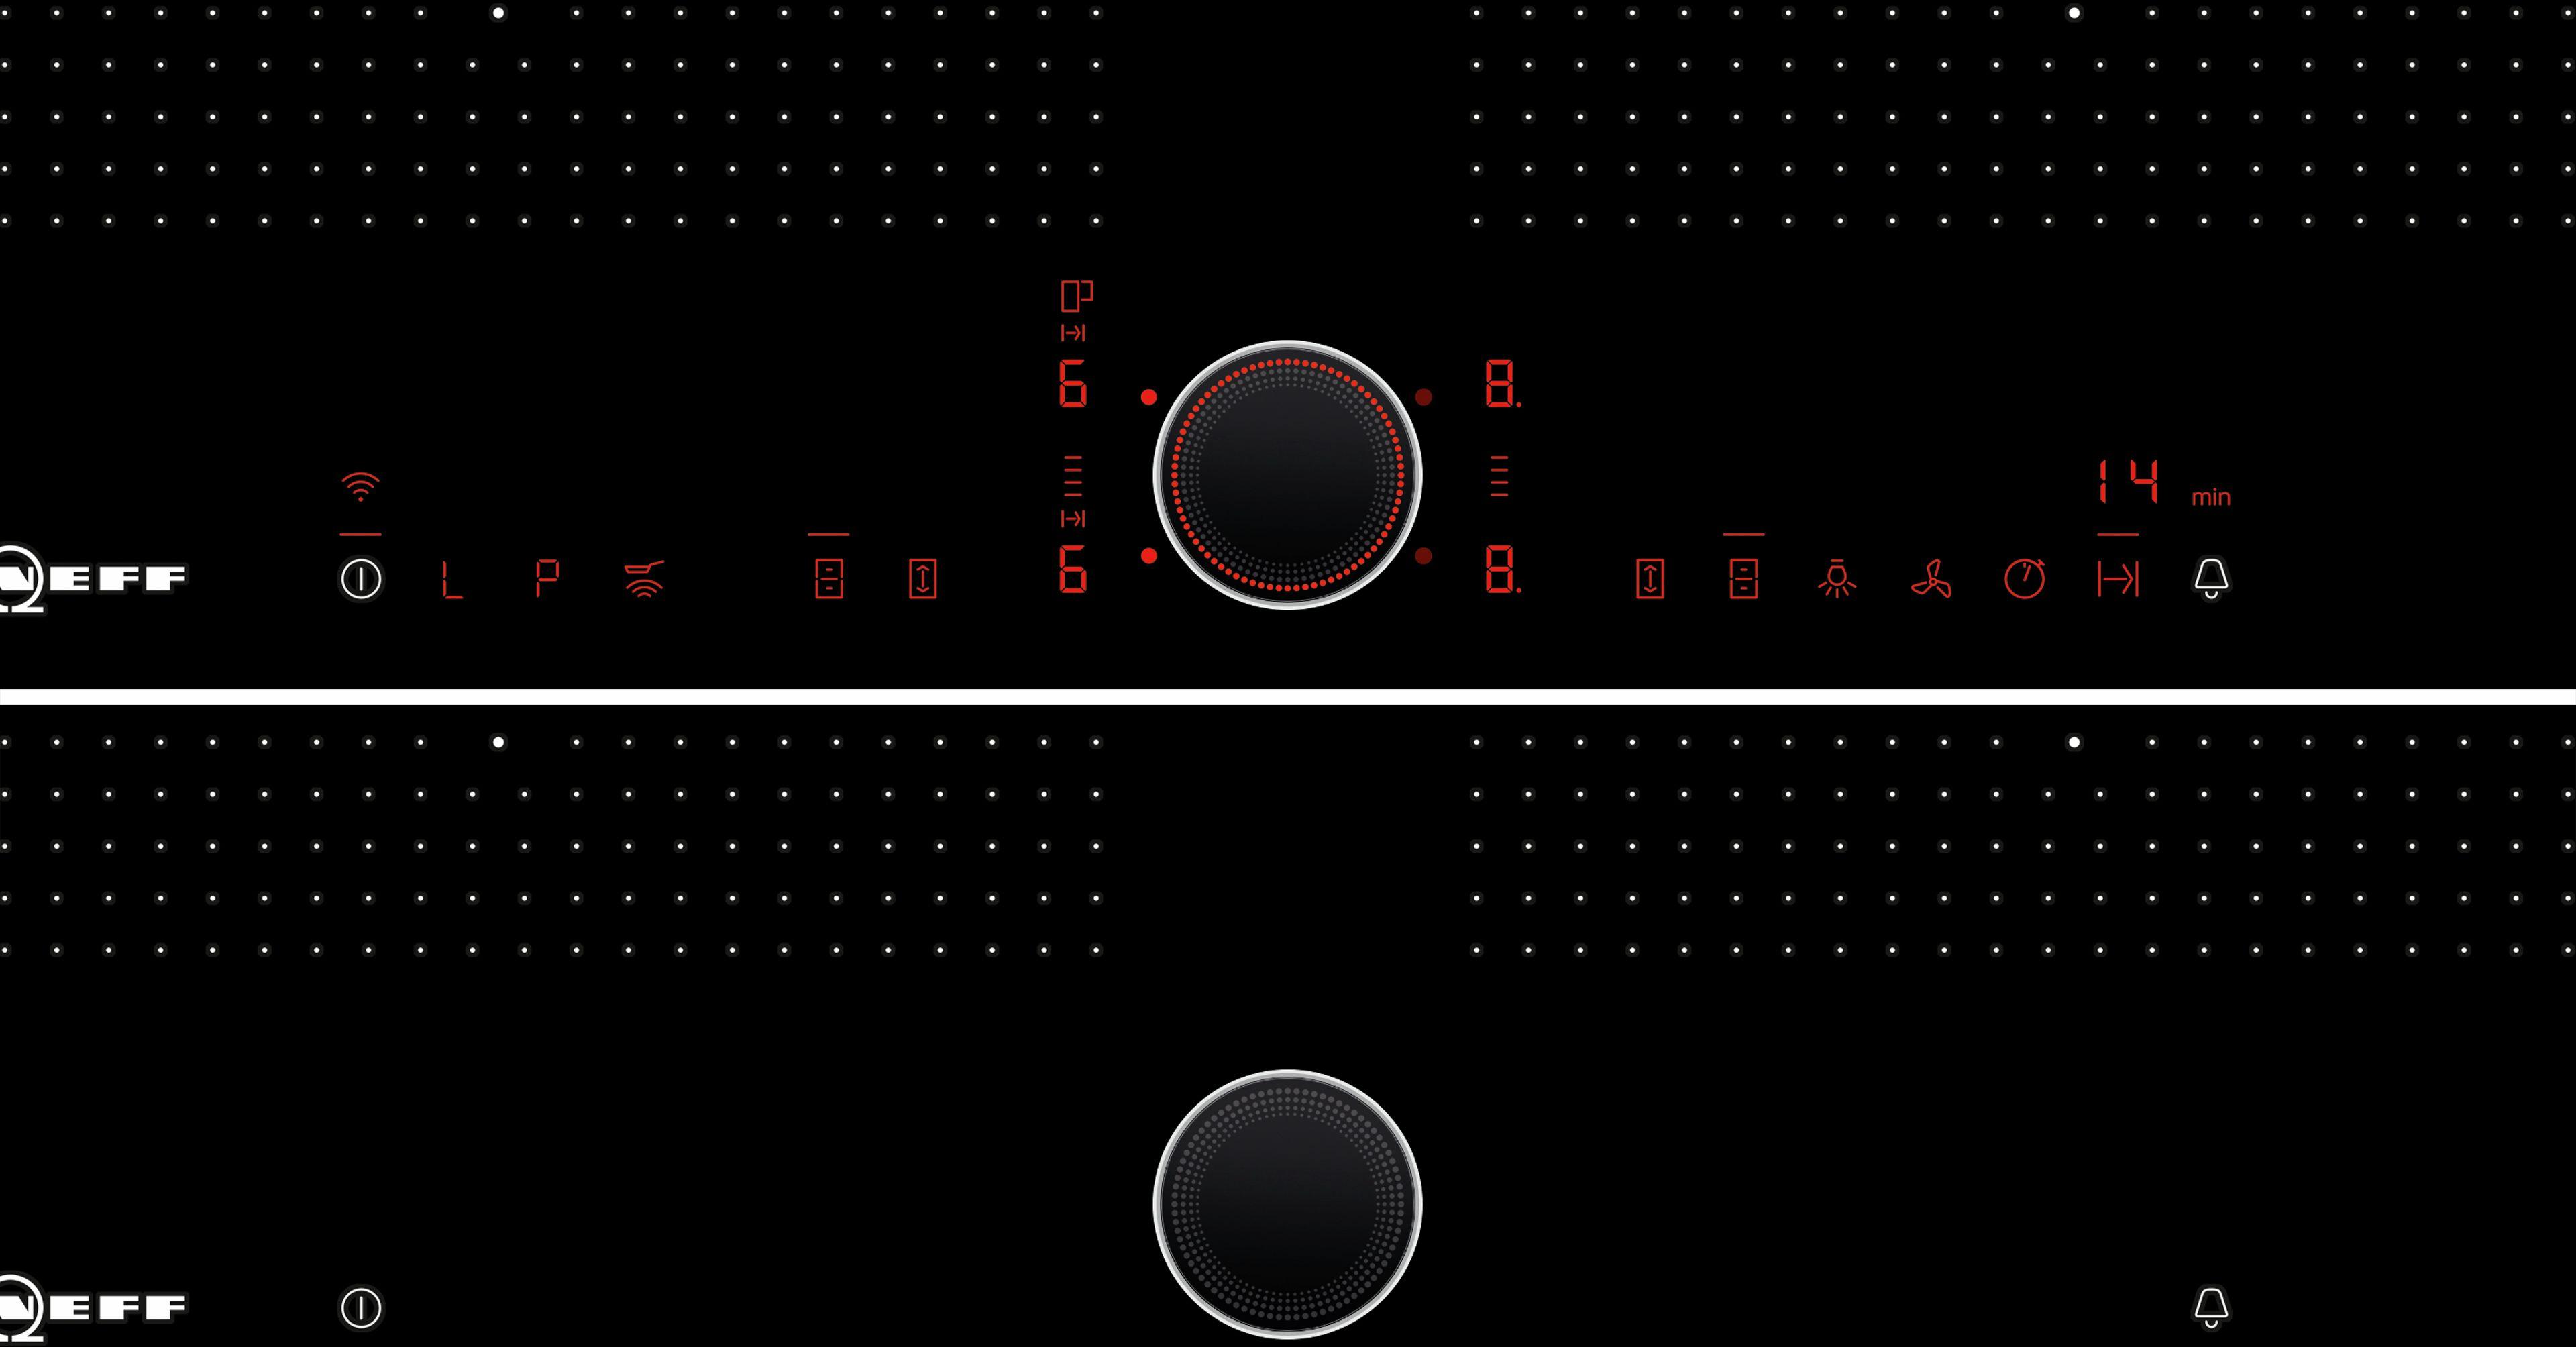 Inductie - vitrokeramisch - 60 cm FlexInductie Plus, 4 kookz. (2 FlexInd.+ midd.z.), TwistPad Fire, FryingS., PowerMove, PowerTransfer, HoodControl